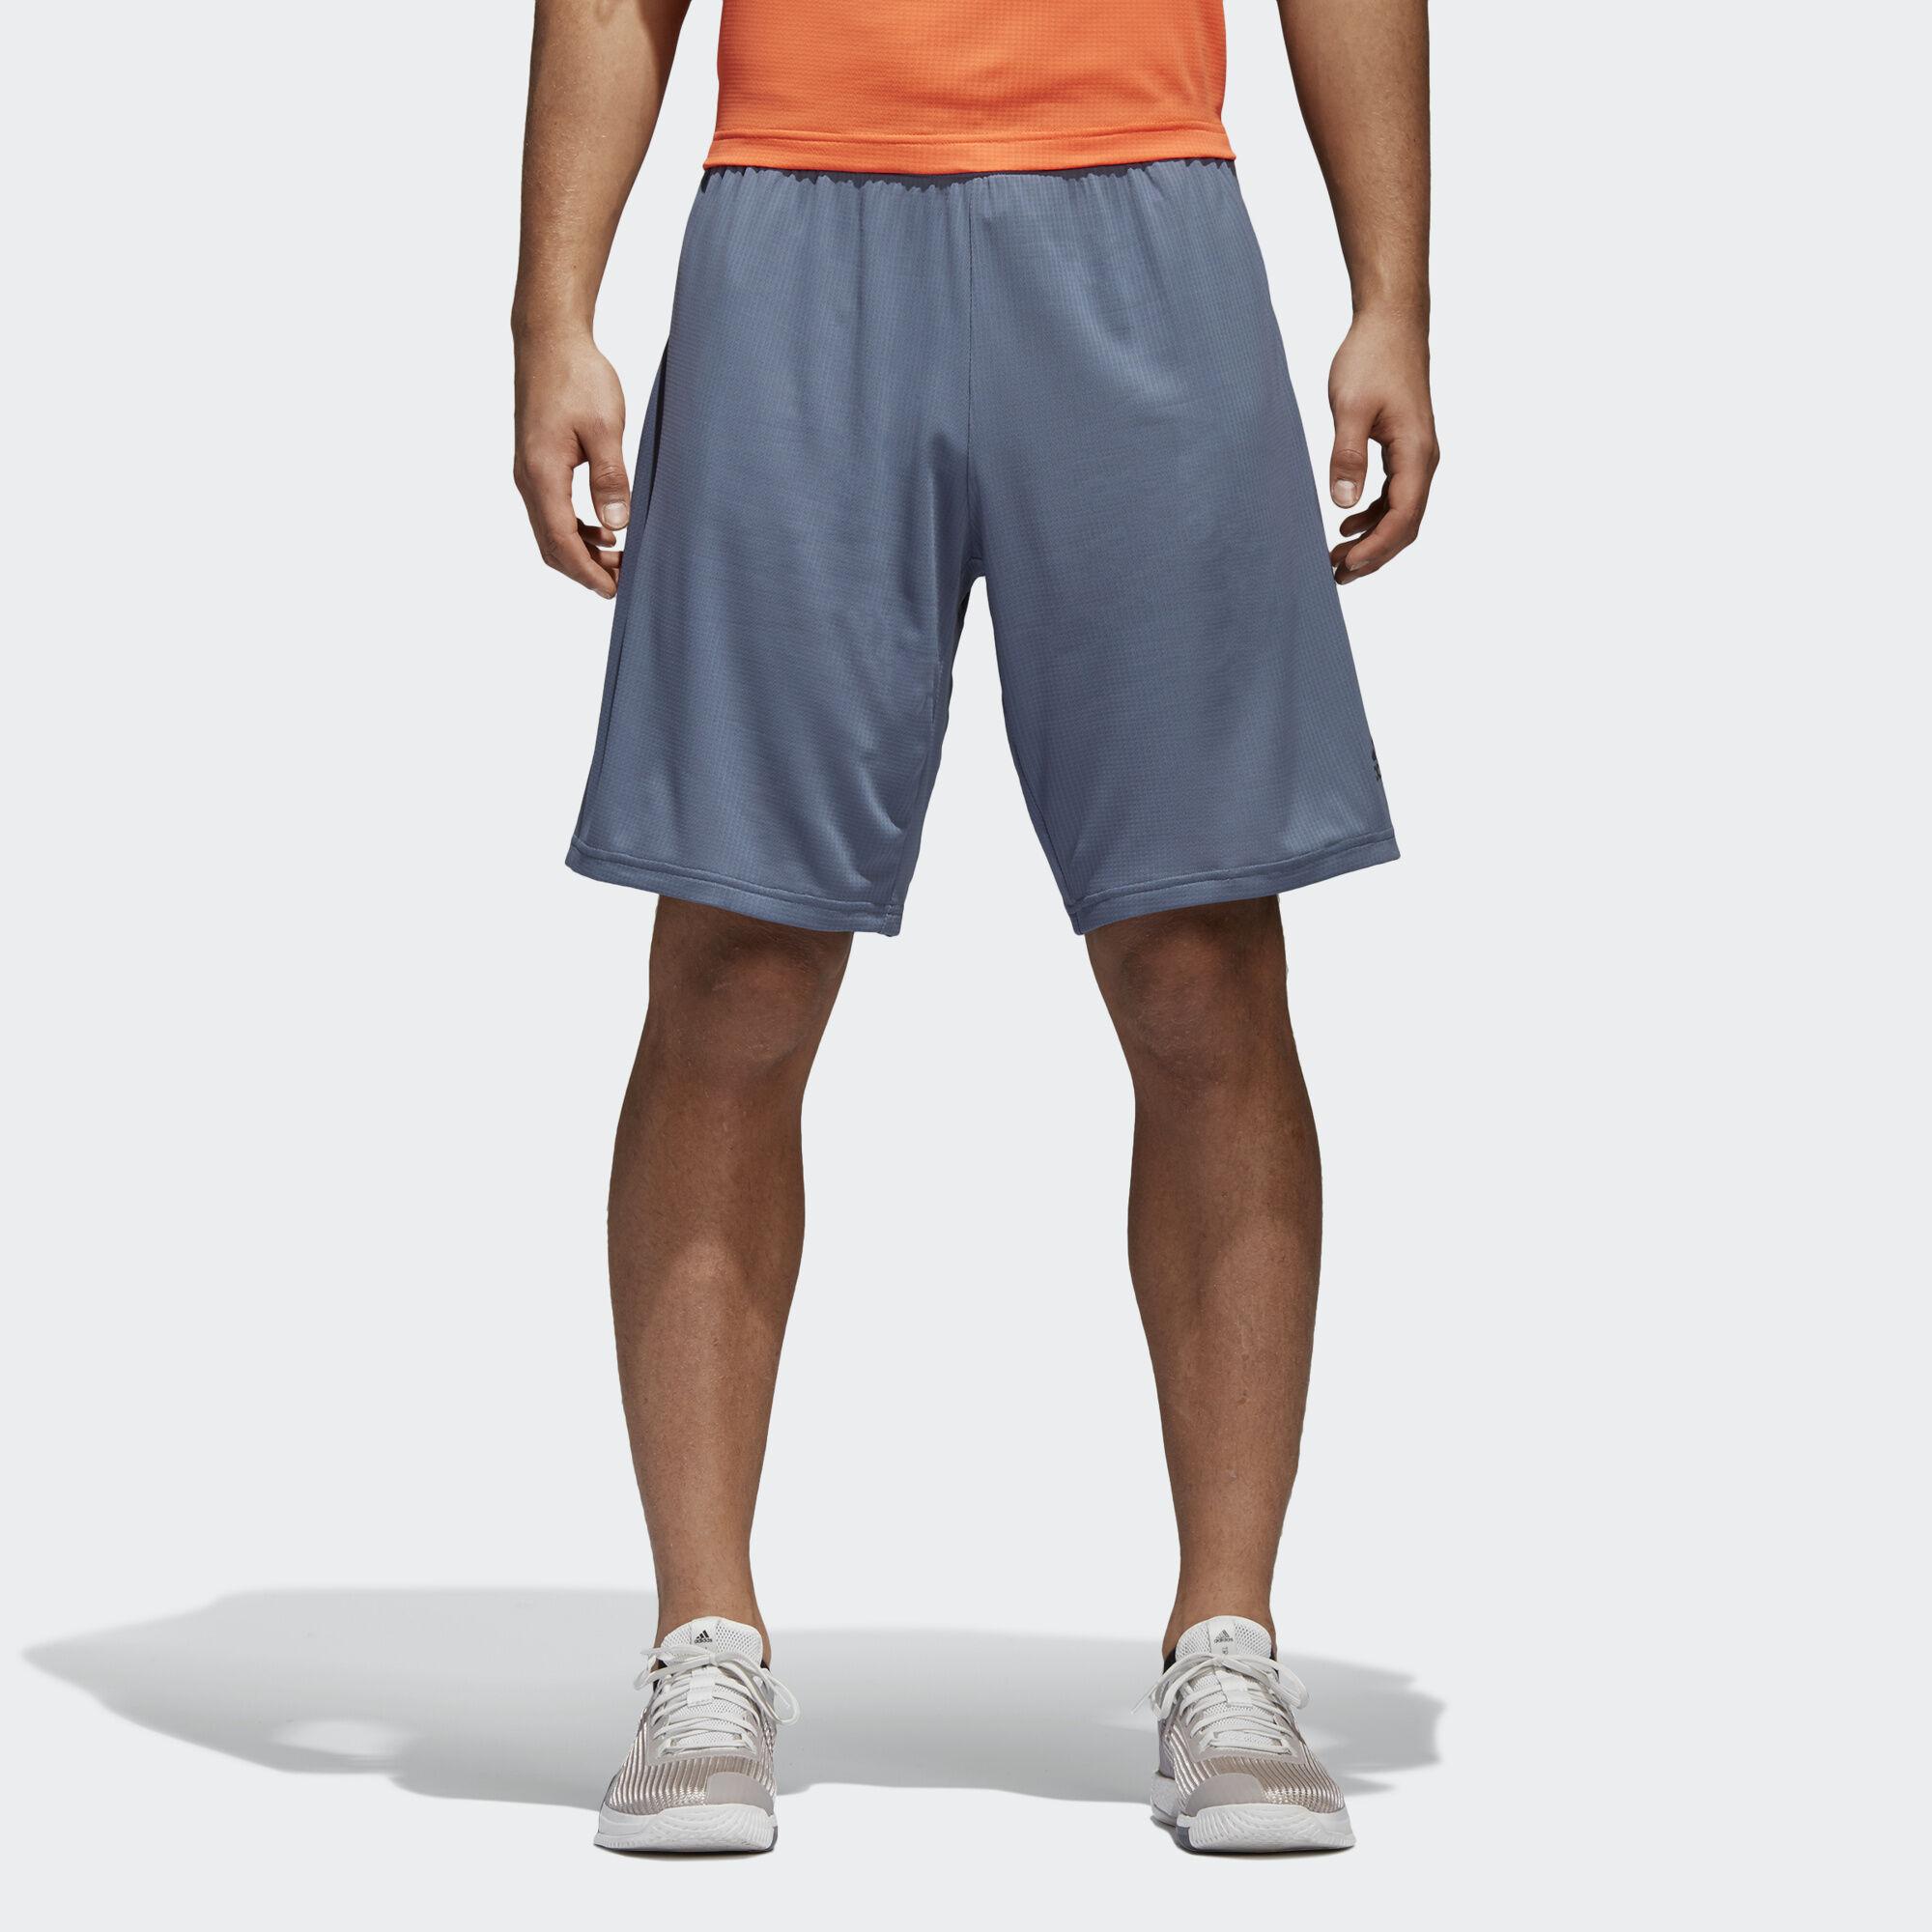 Adidas 4krft Regional Blue Climachill Corto Pantalón TRH68W7I6